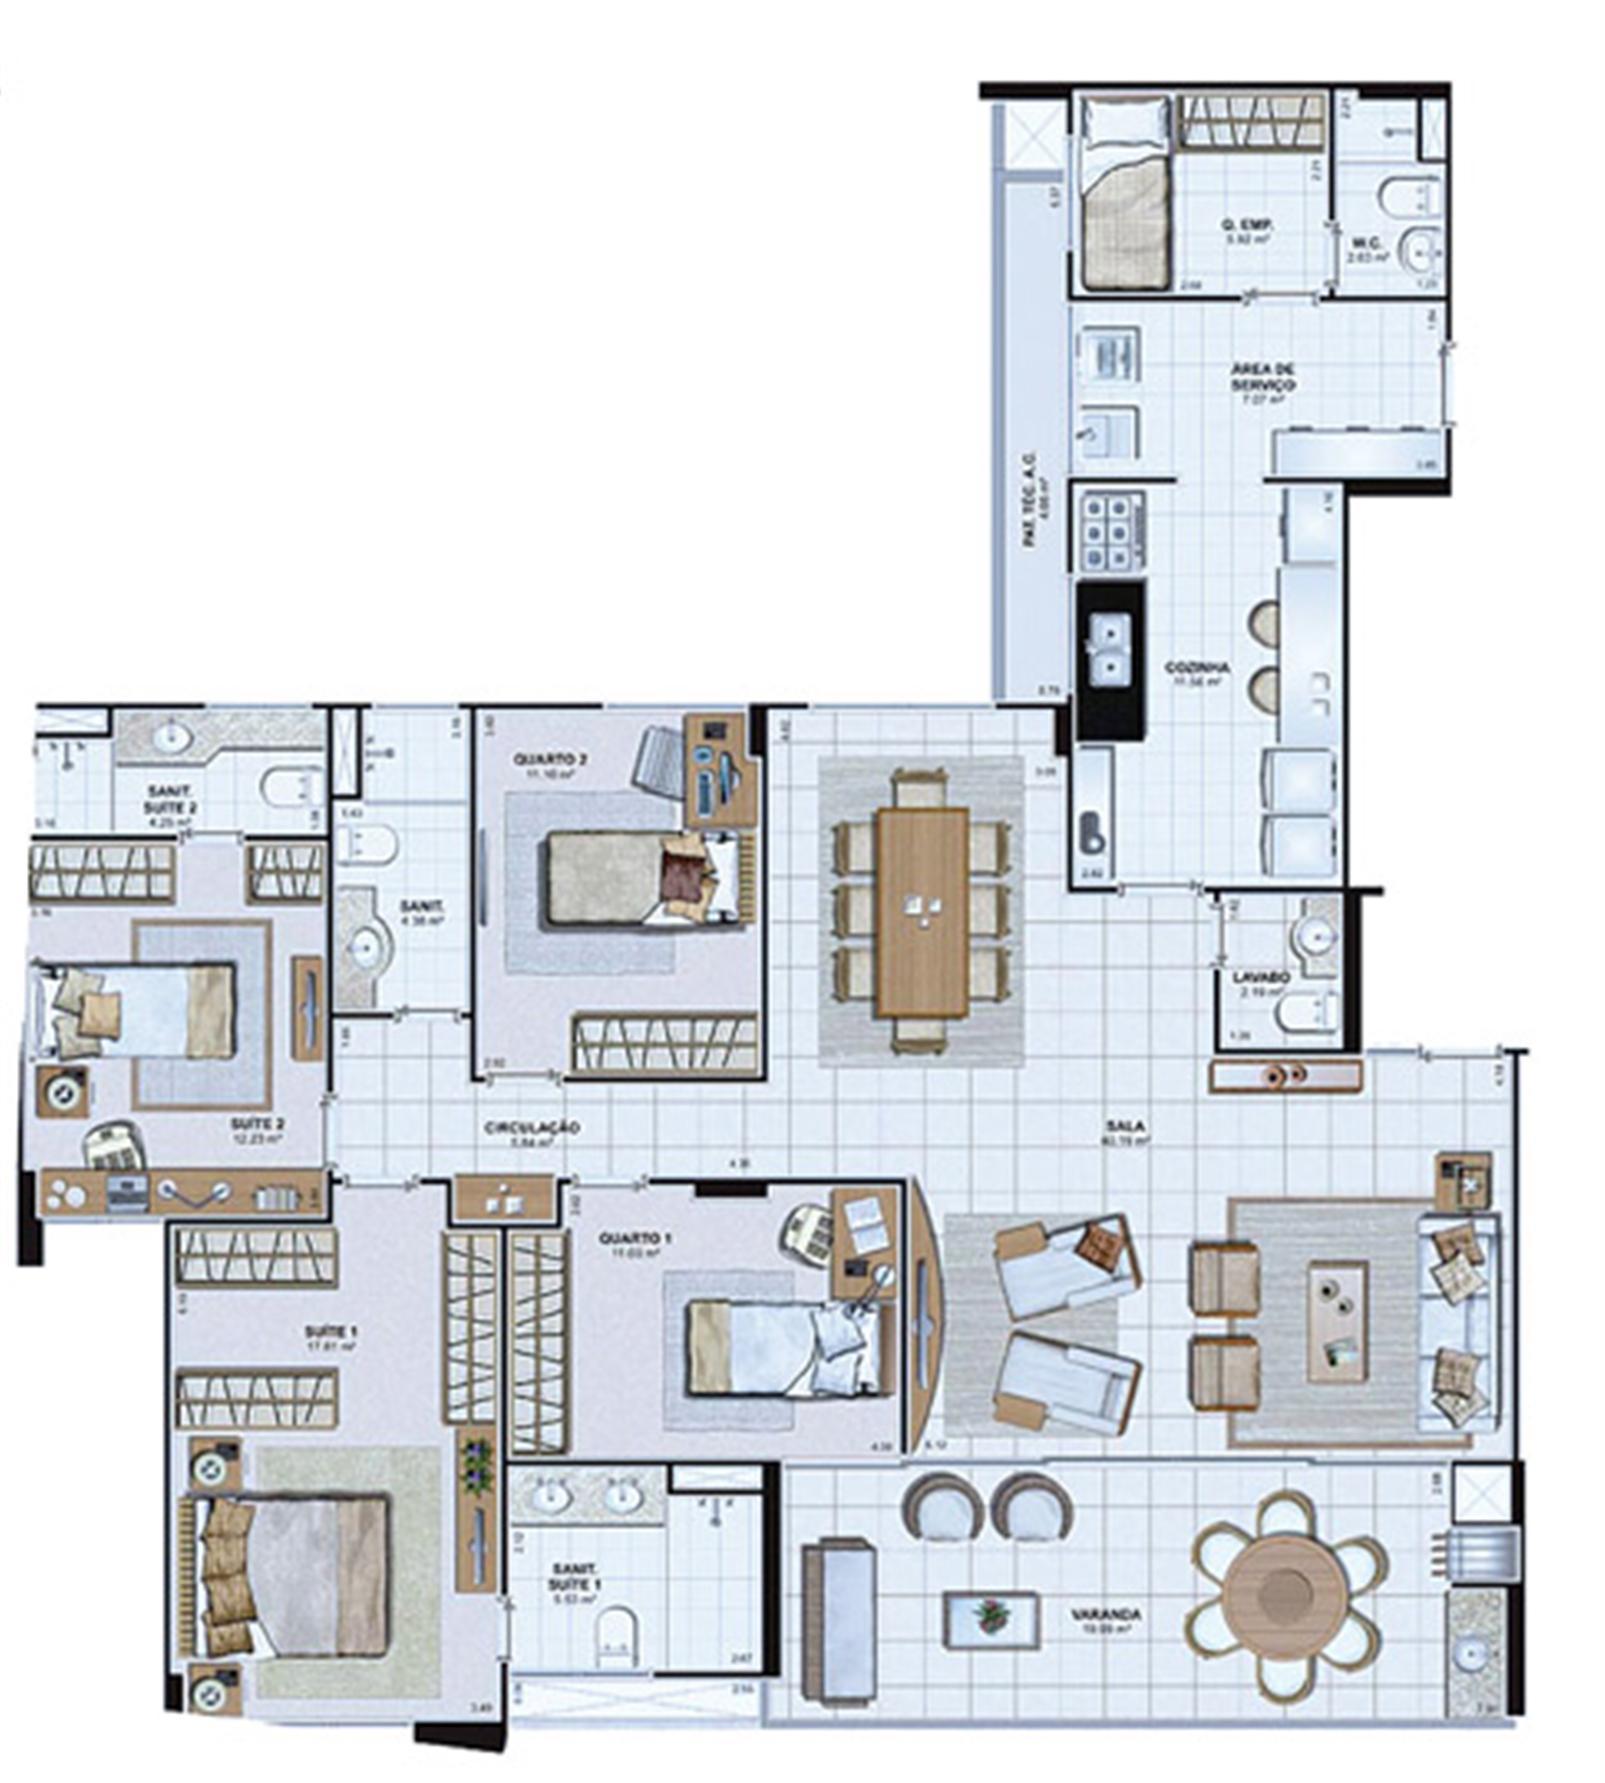 Planta Tipo 166,18 m² | Le Parc Salvador – Apartamentona  Av. Paralela - Salvador - Bahia